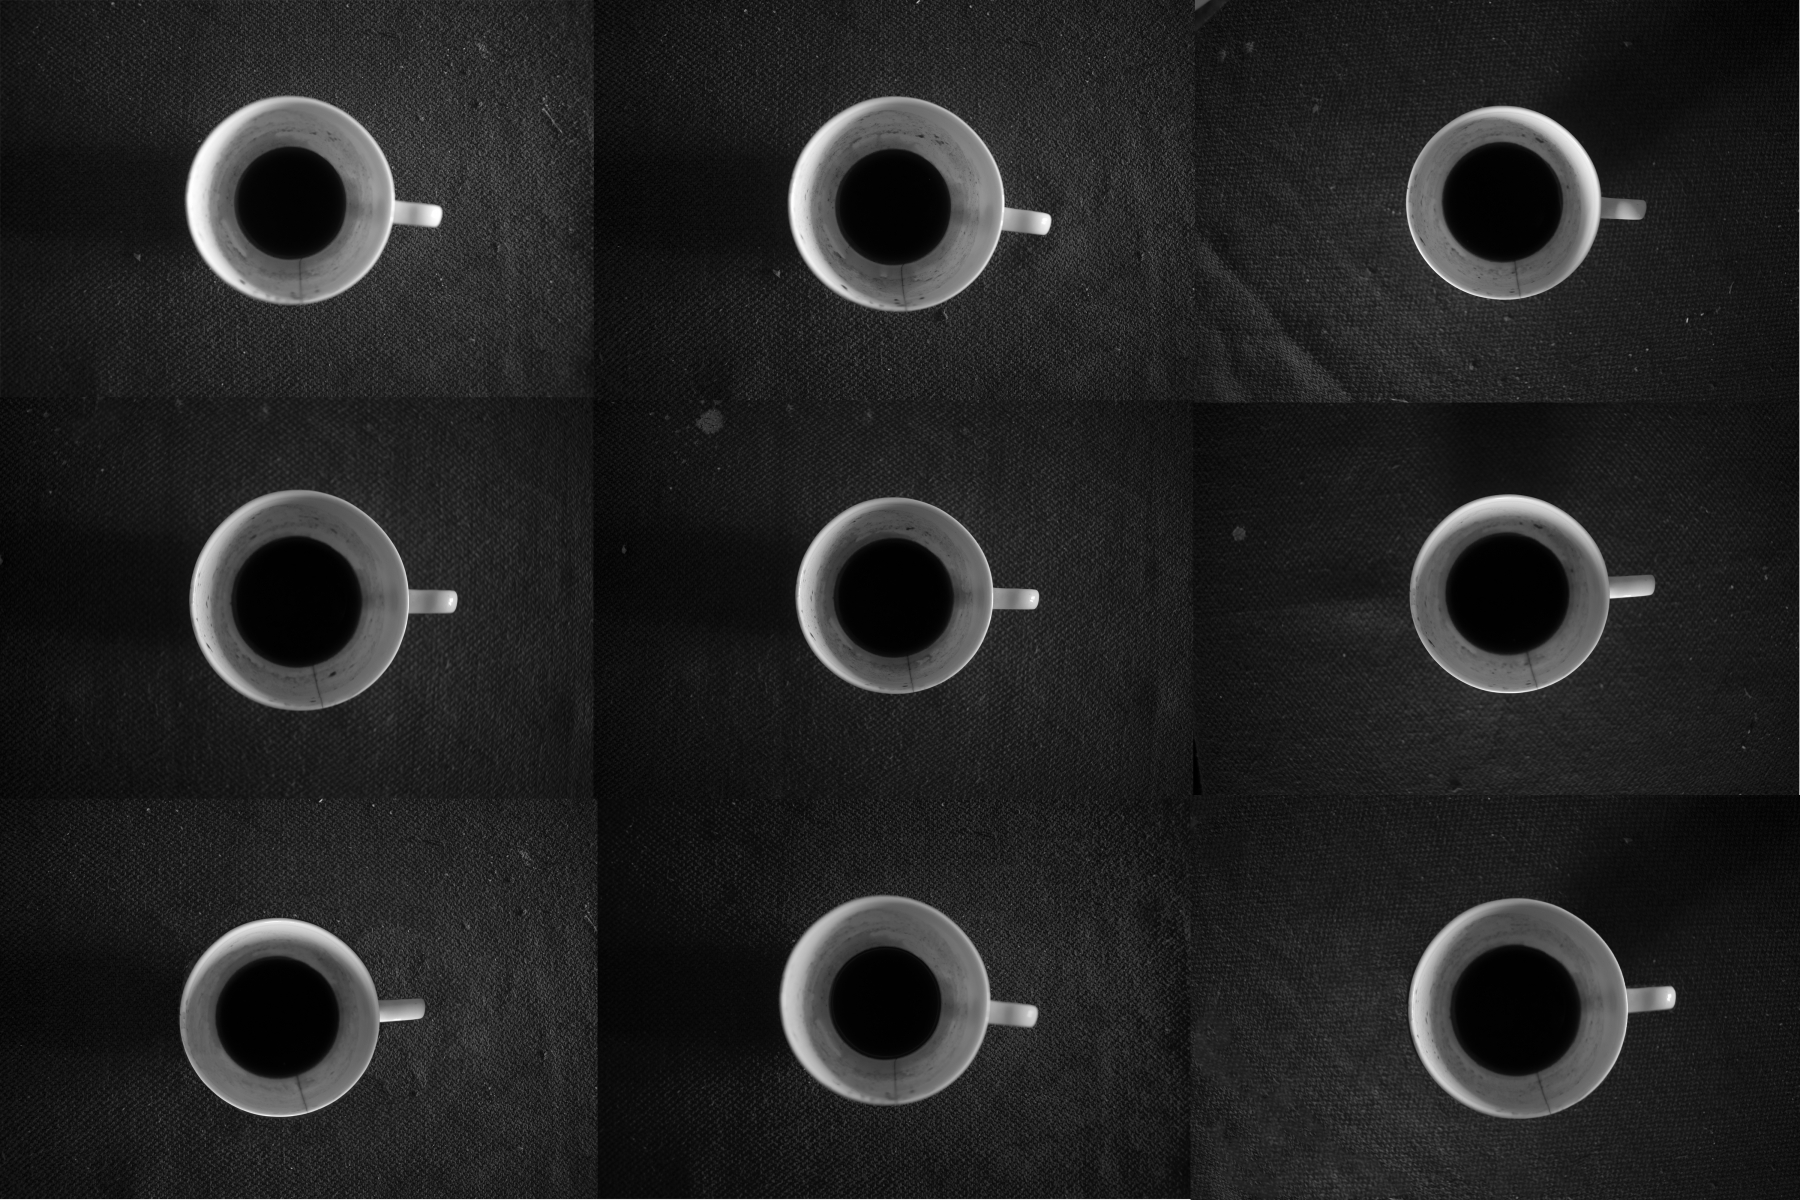 09_TEJAS BALAPALLI, coffee-2